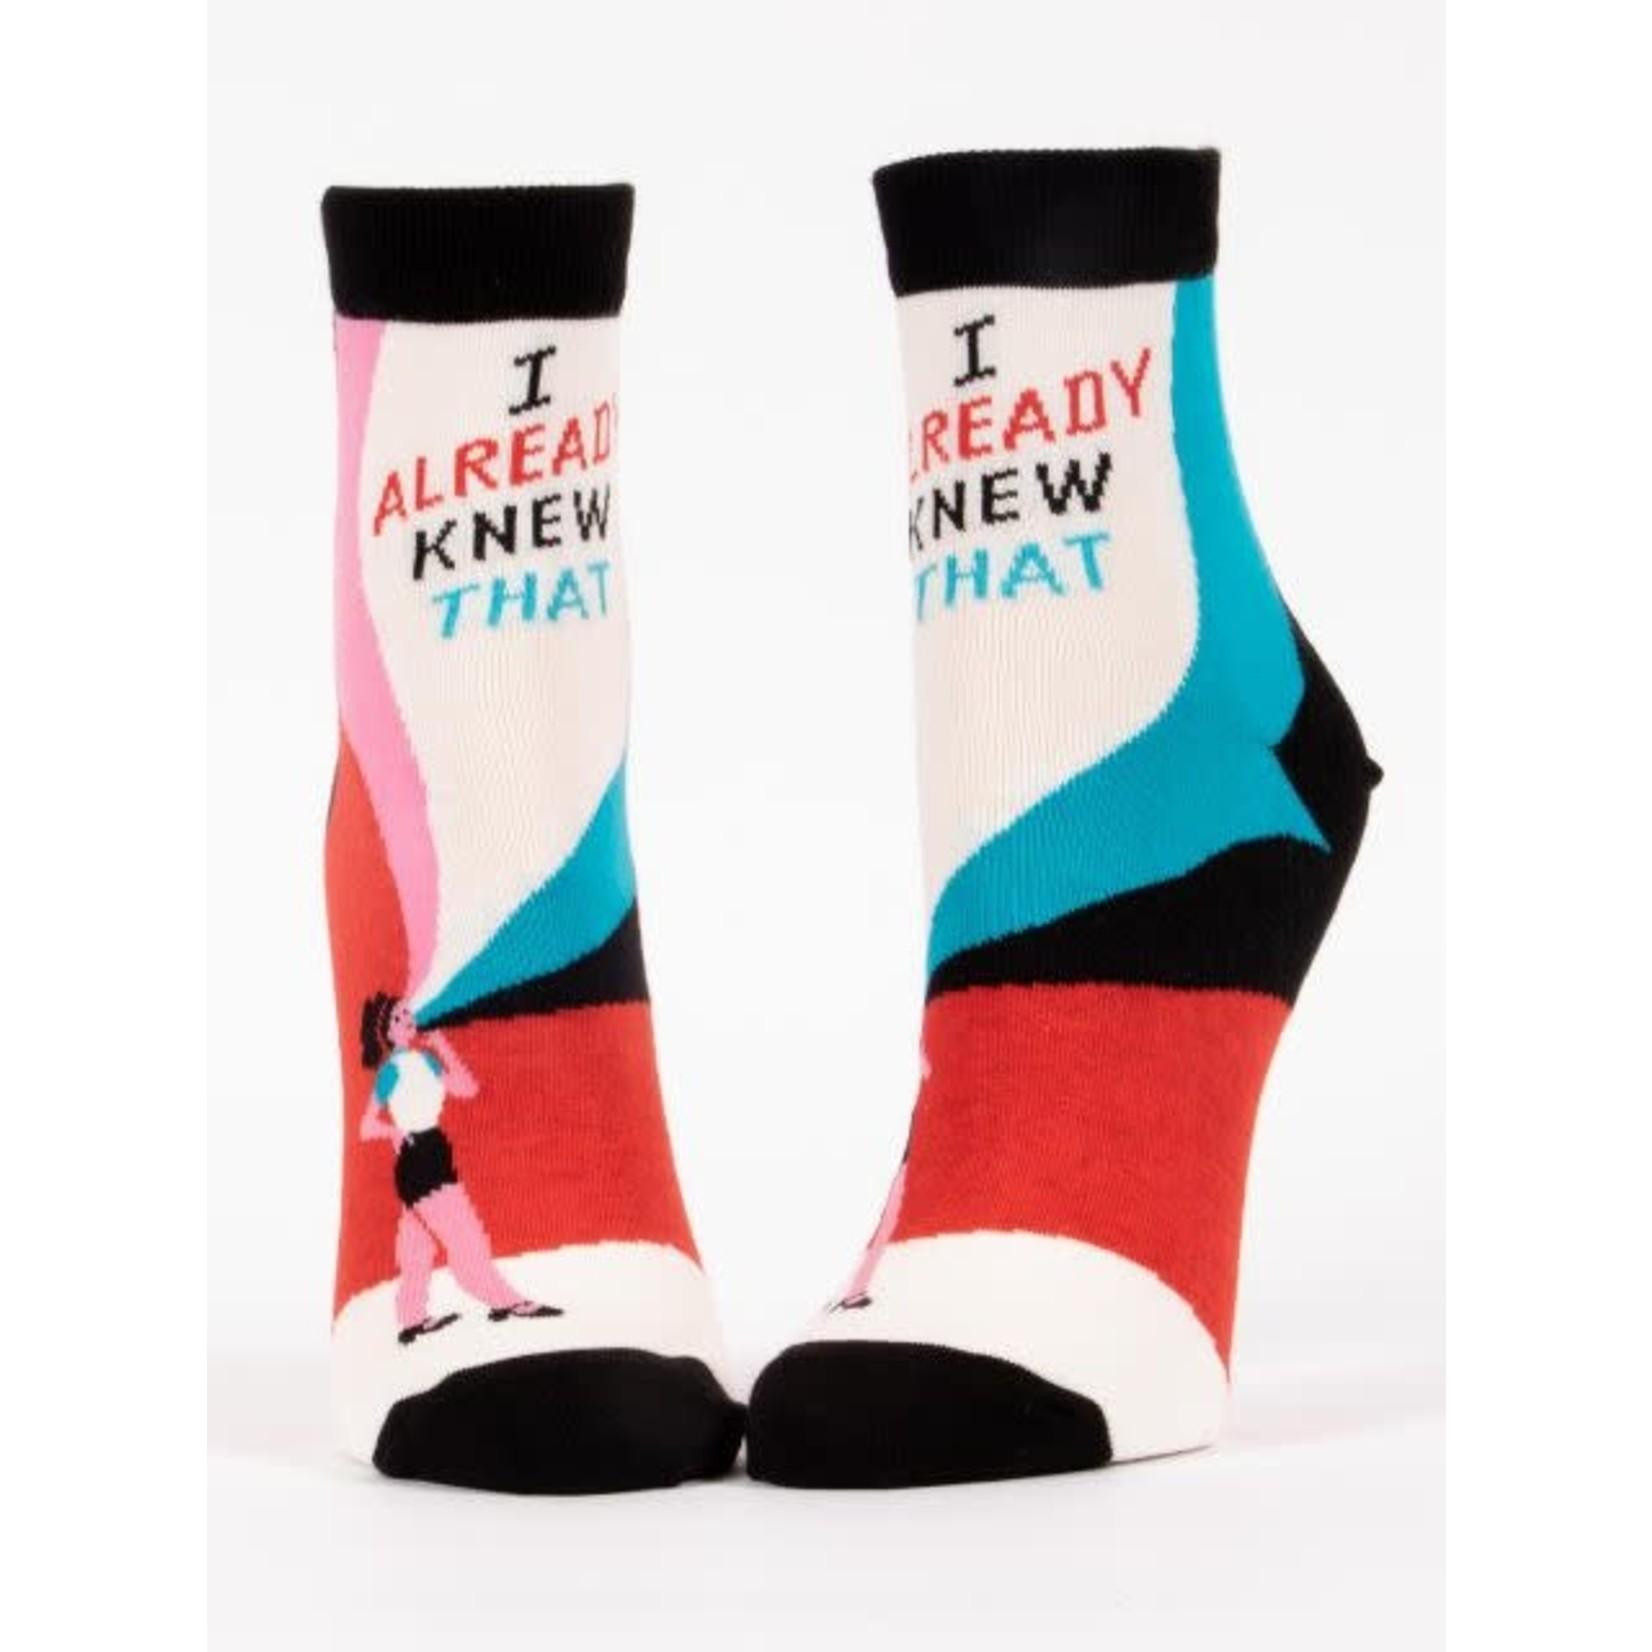 Socks (Womens) (Ankle) - I Already Knew That